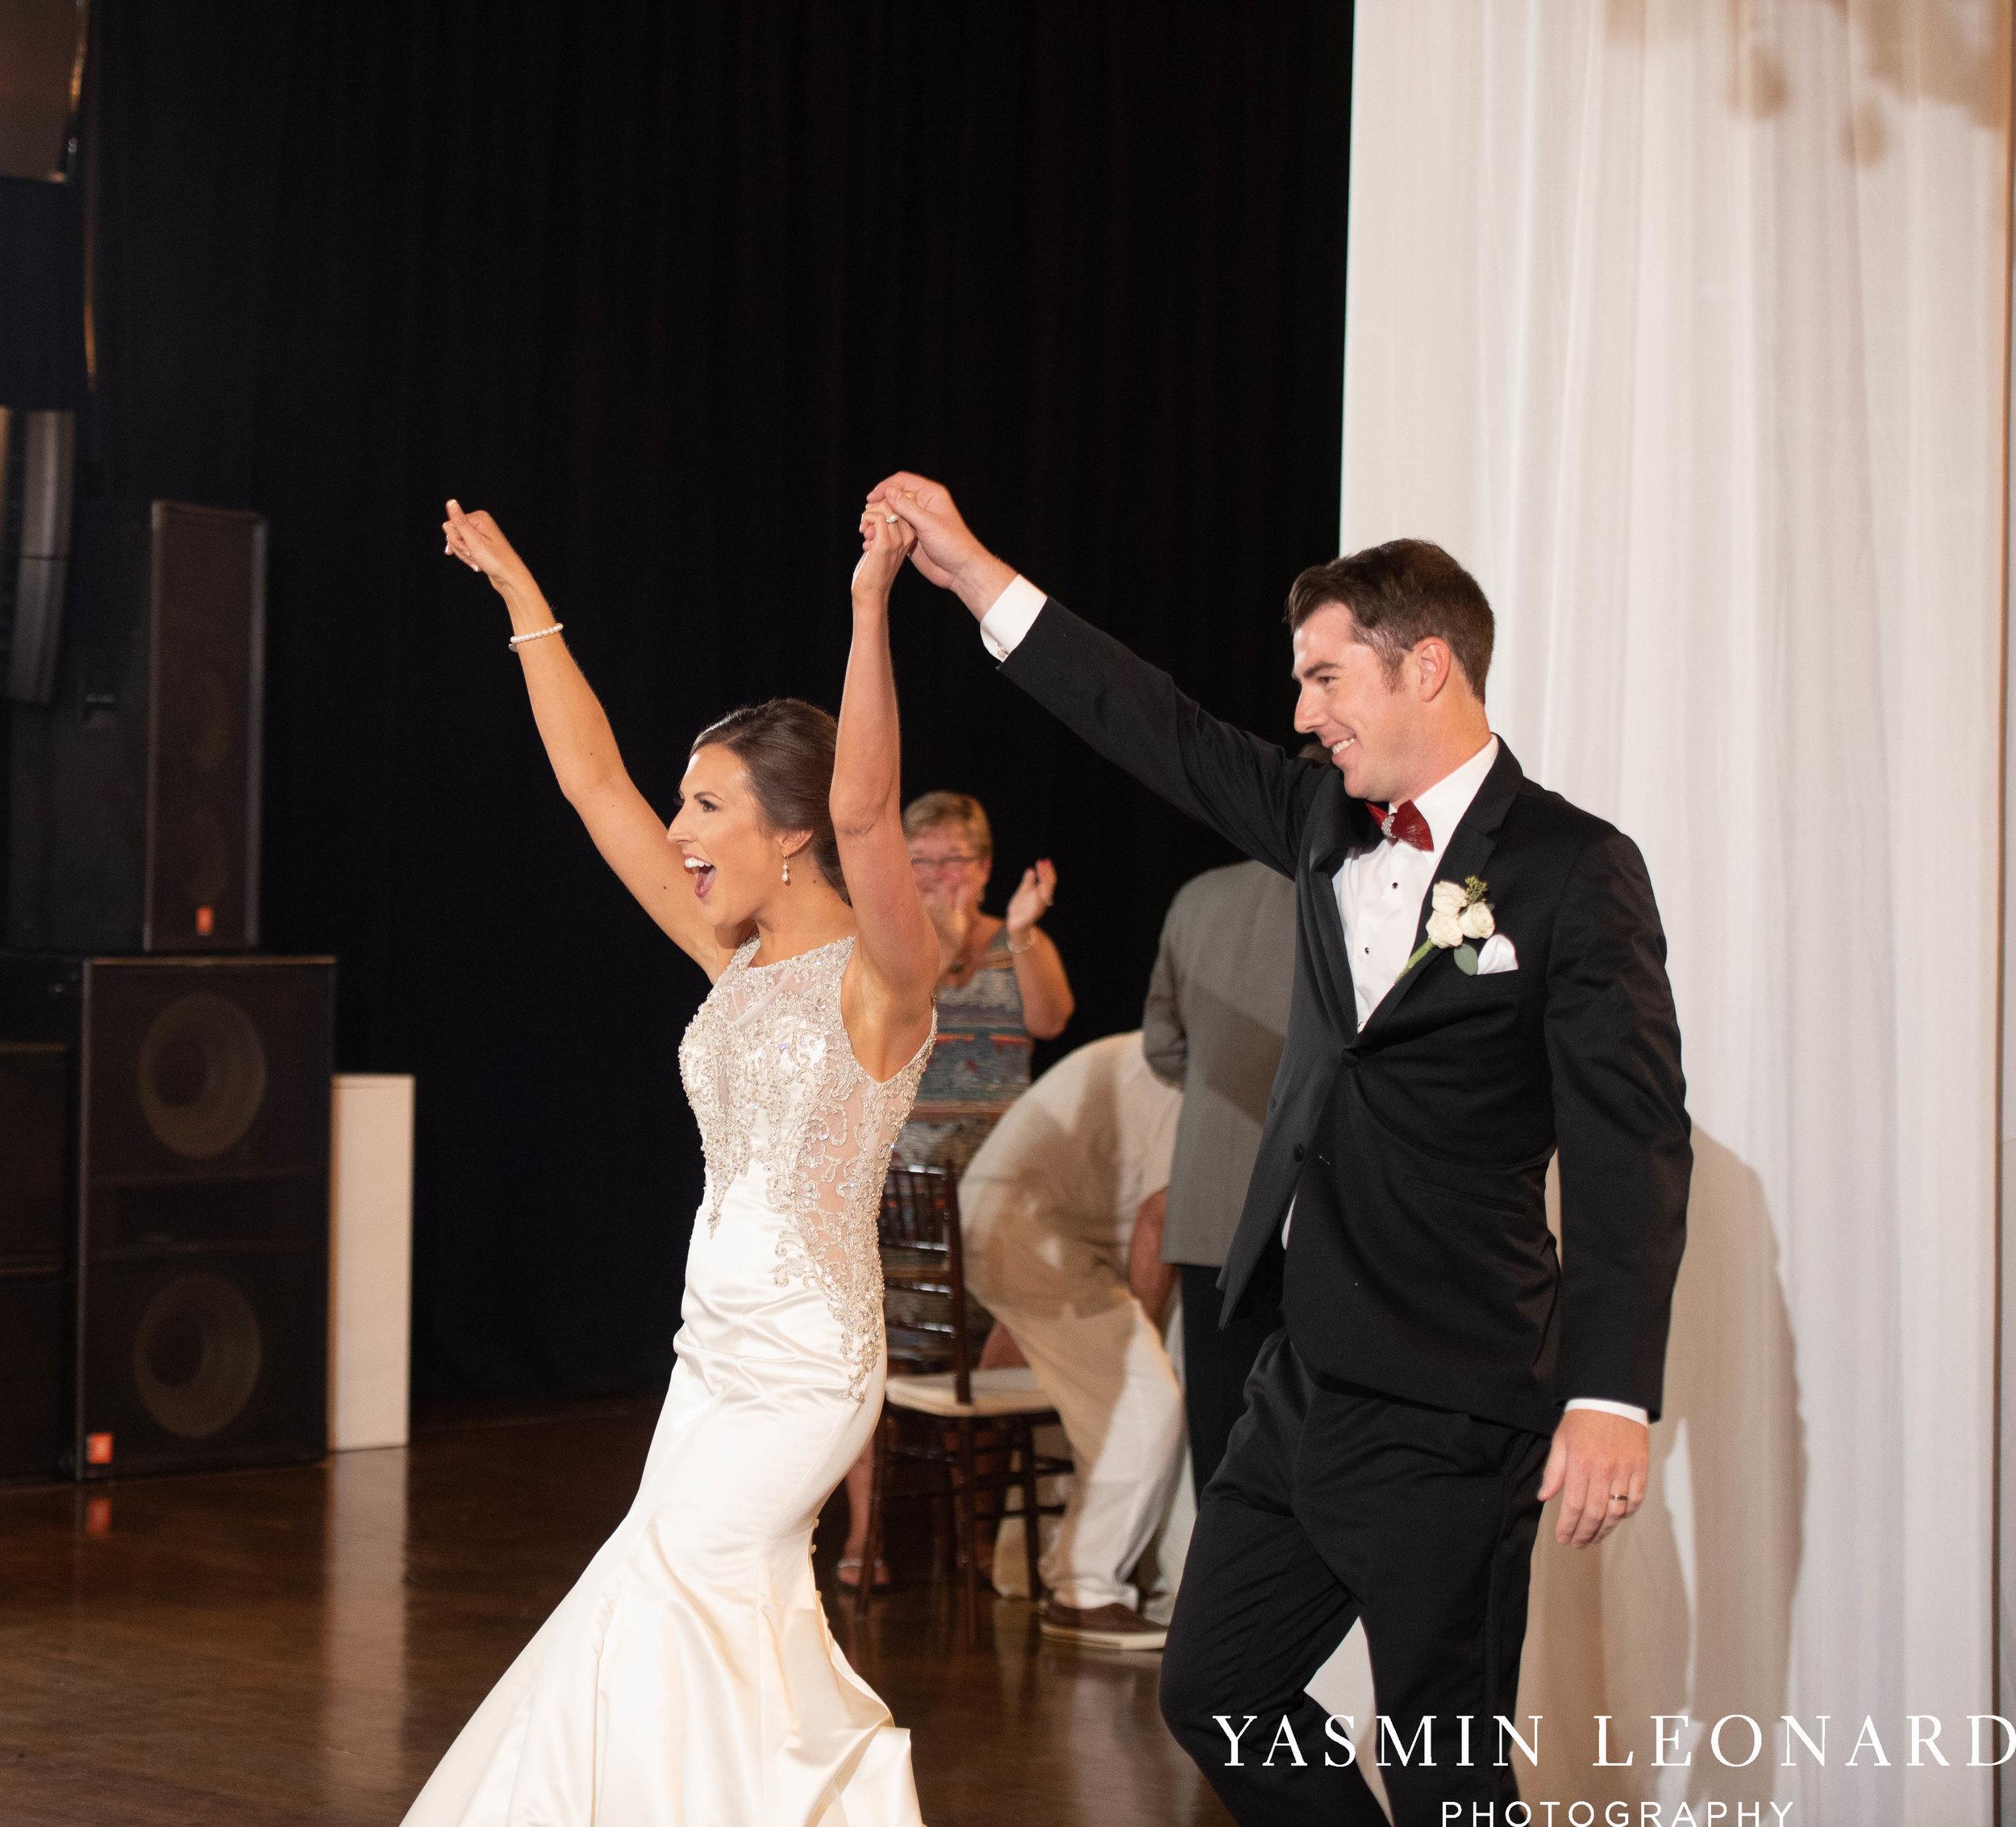 Millennium Center Wedding - Downtown Winston Salem - Winston Salem Wedding Photographer - Winston Salem Venues - Indoor Wedding Venues - NC Wedding Photographer - Yasmin Leonard Photography-70.jpg